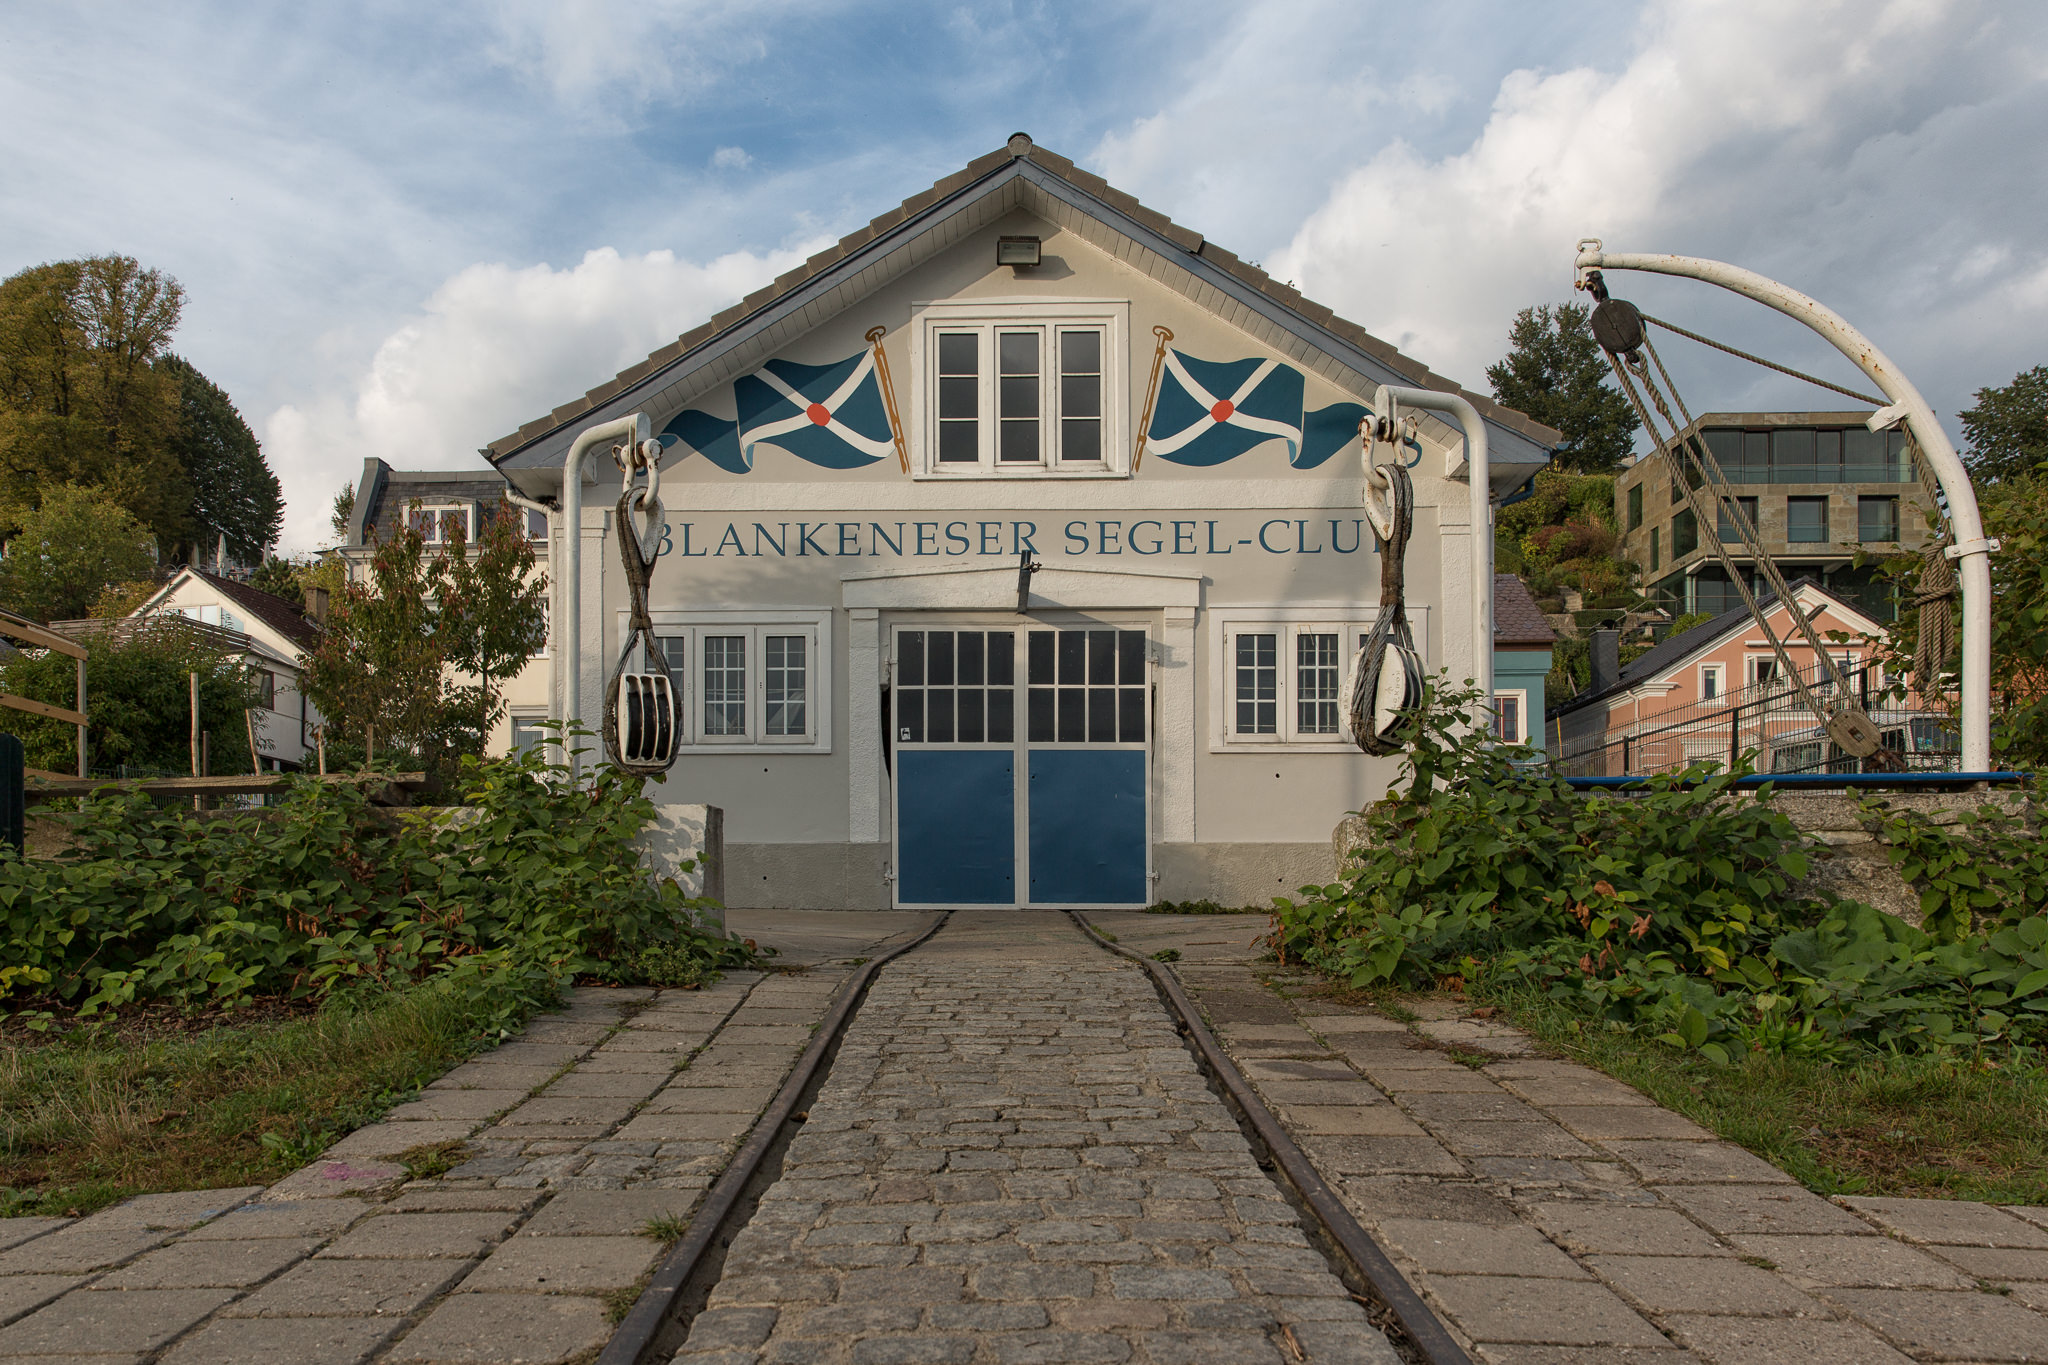 Blankeneser Segel-Club